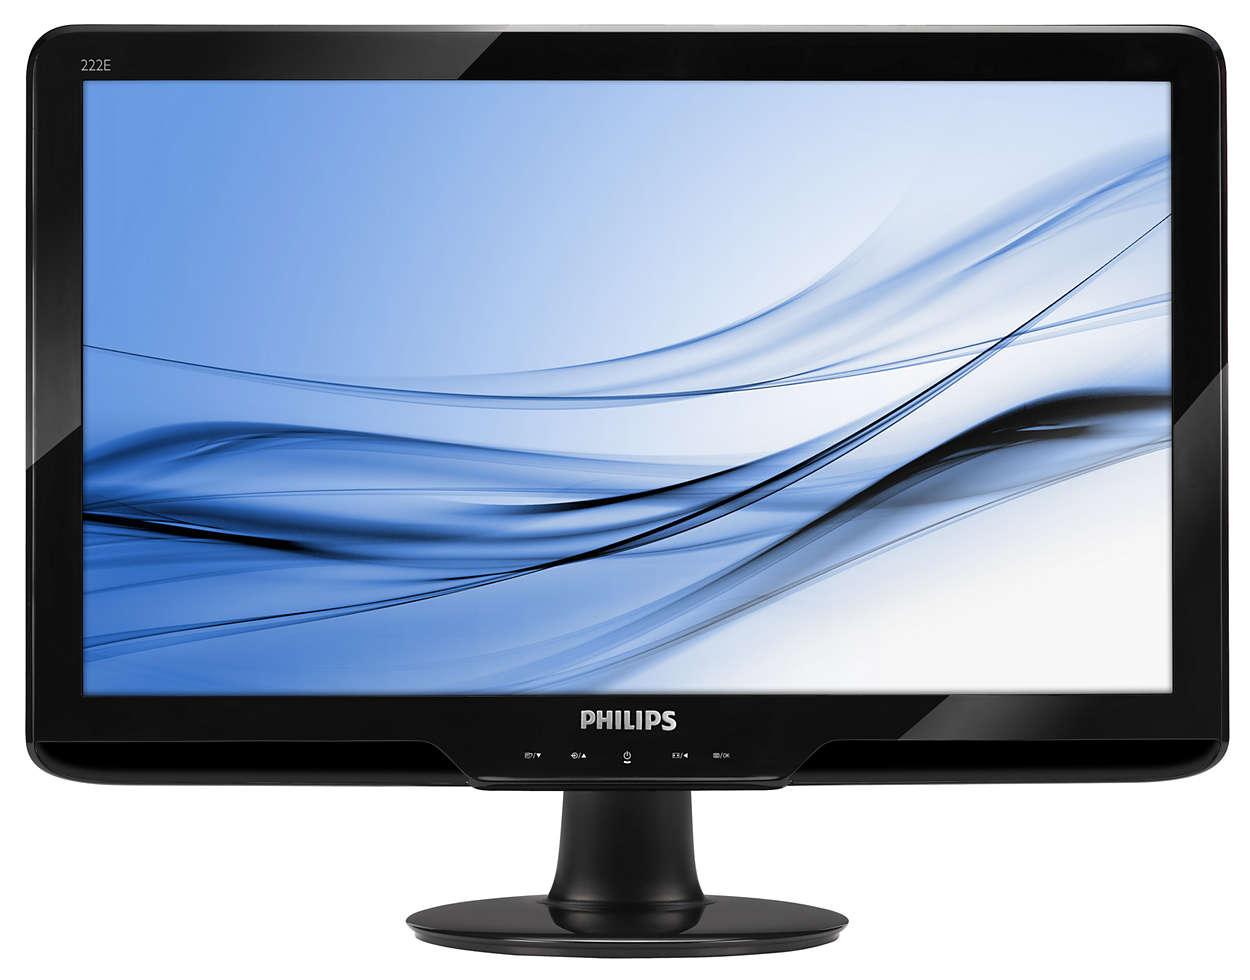 Elegant Full HD display offers great value